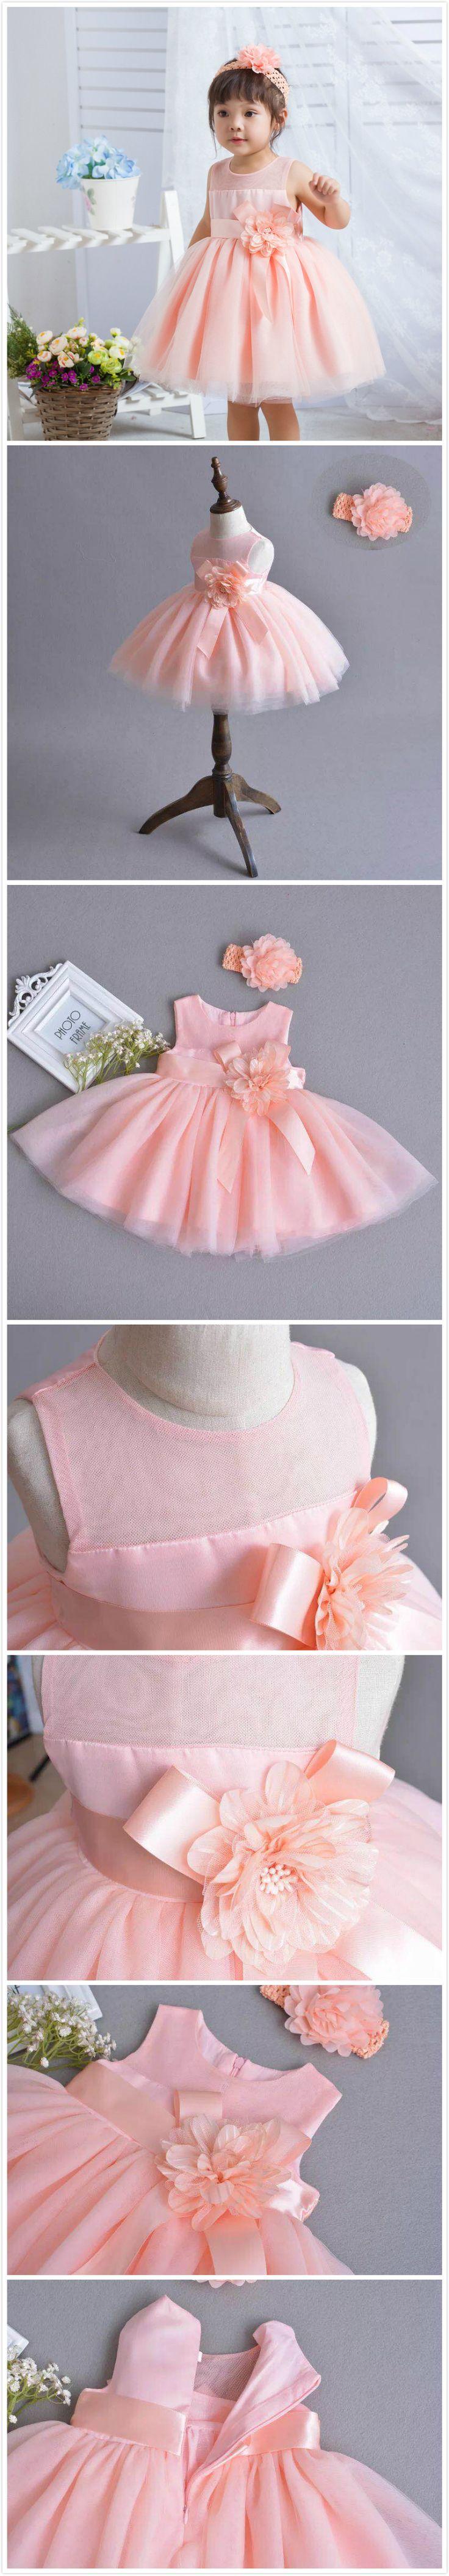 Baby & Toddler's Girl Pink Lace Dress Princess Dress For Wedding